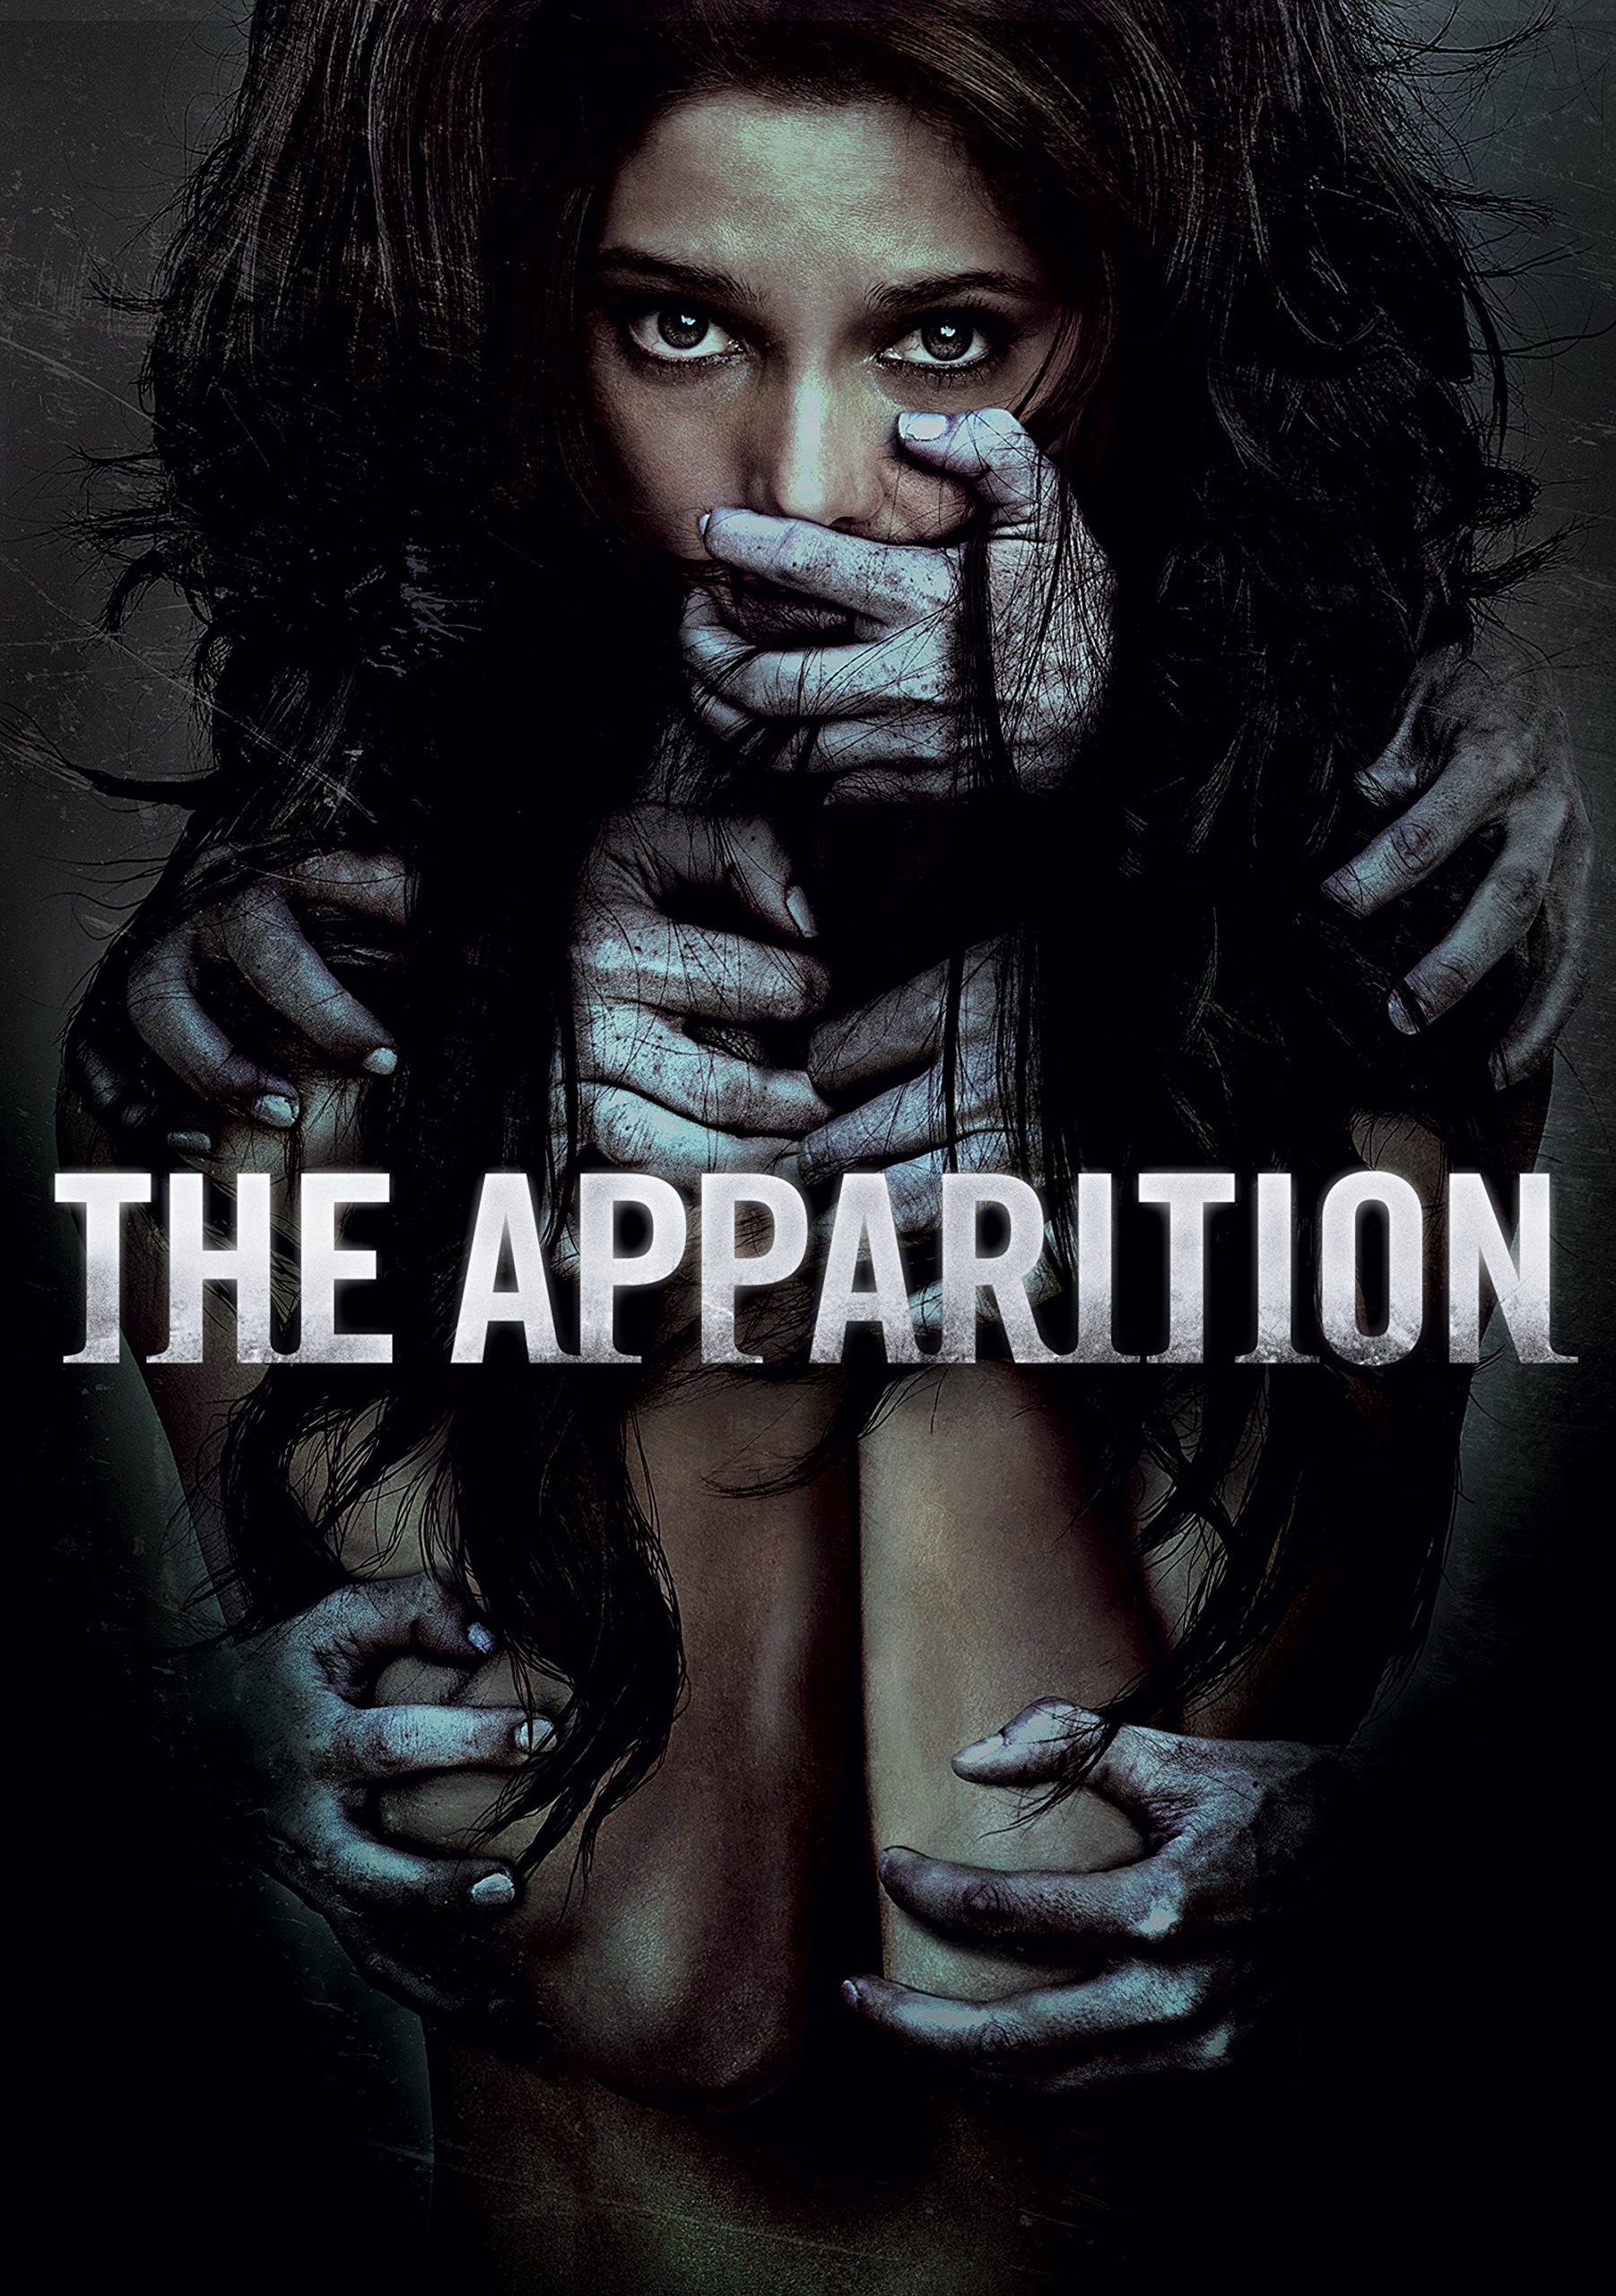 Amazon.com: The Apparition: Ashley Greene, Sebastian Stan, Tom Felton, Todd  Lincoln: Amazon Digital Services LLC